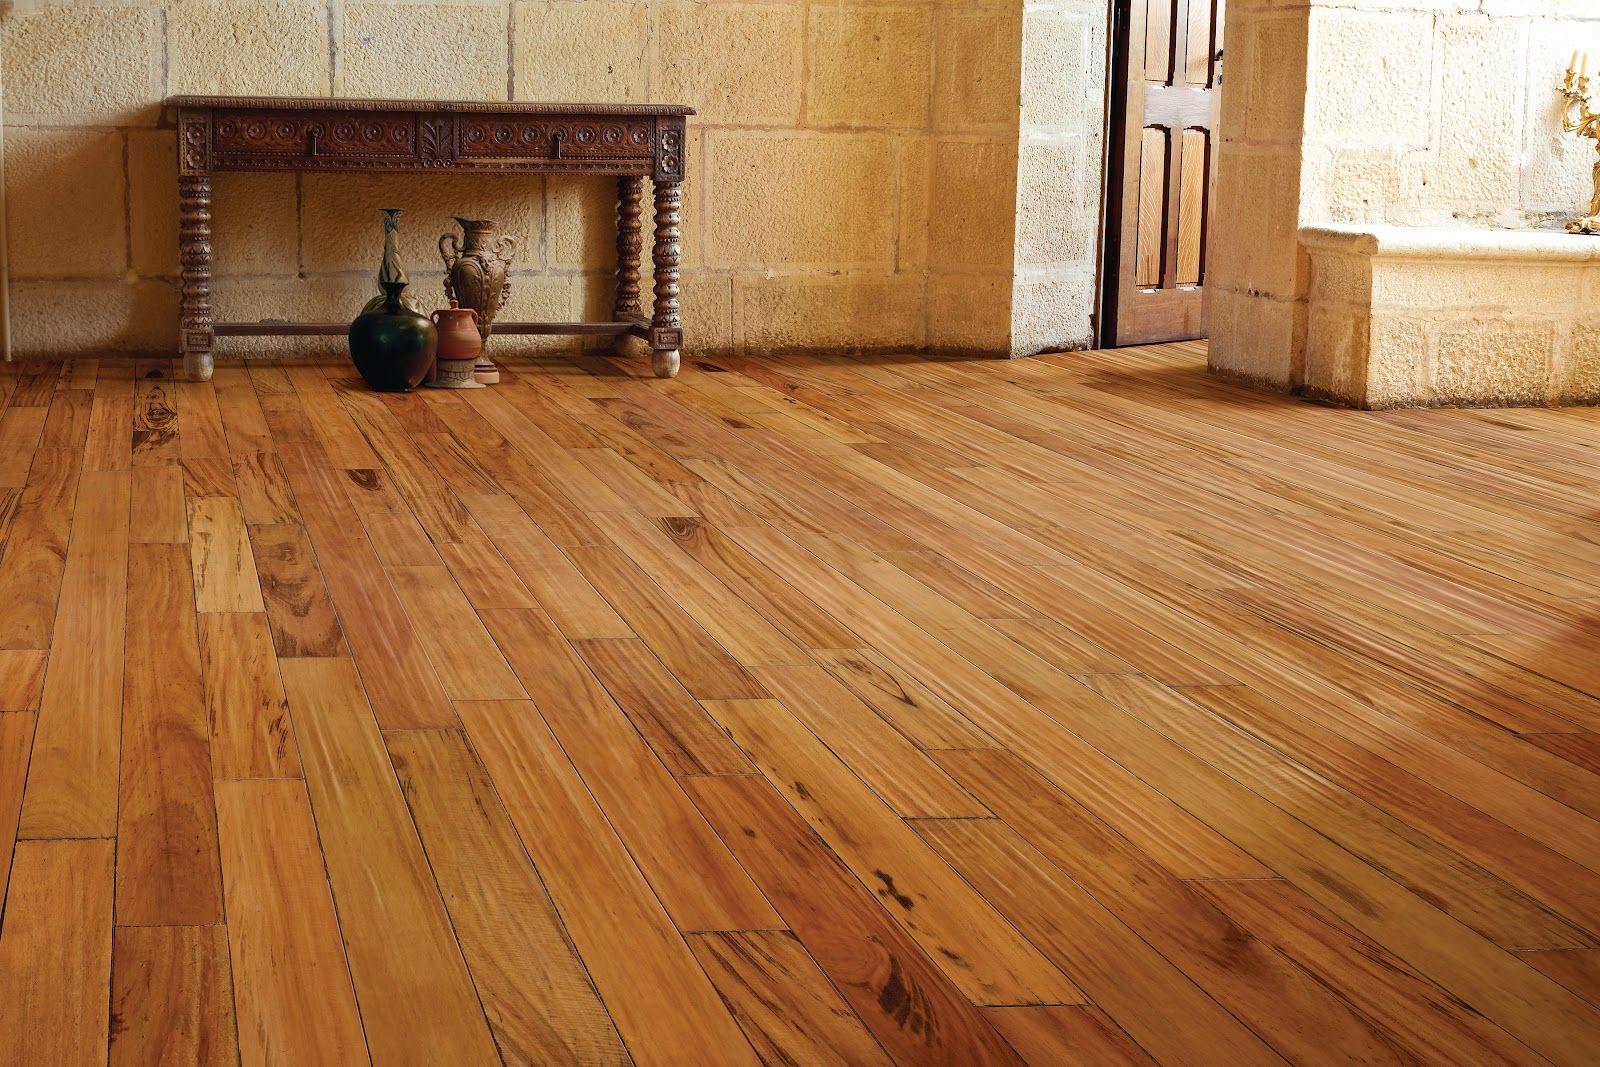 Floor Design Heavenly Home Interior And Flooring Ideas Using